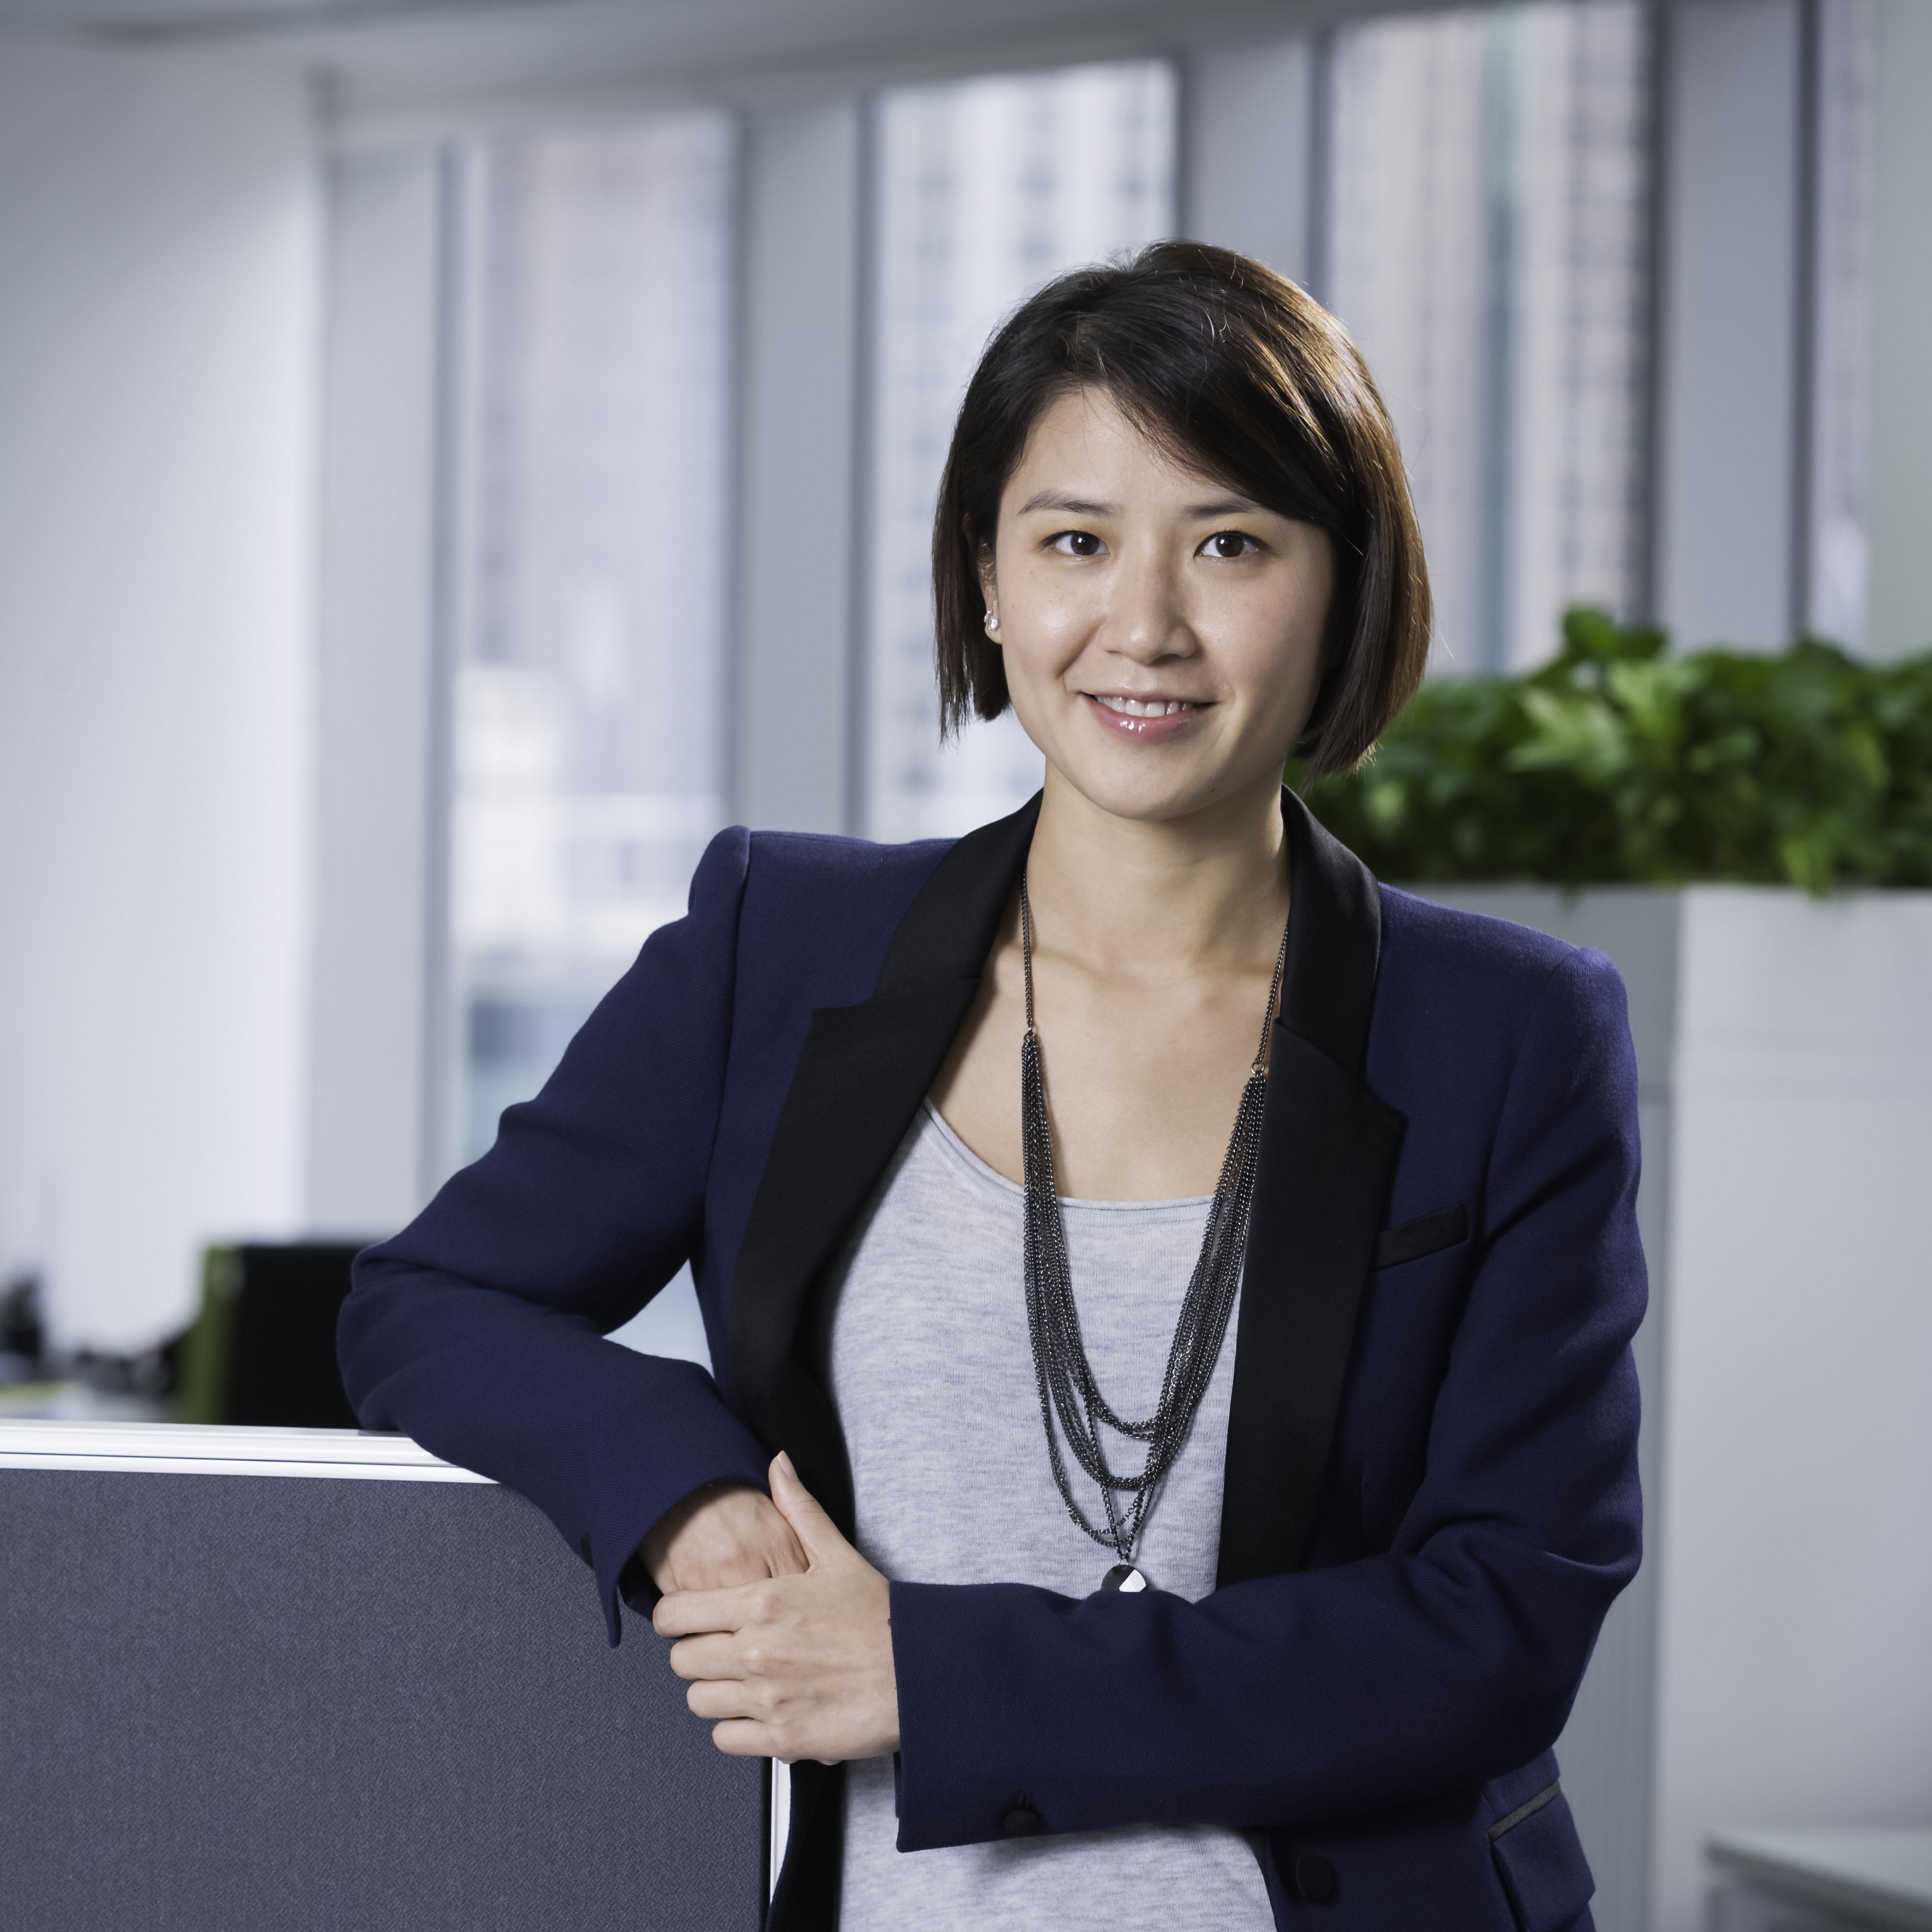 Bonnie Lo, NewQuest Capital Partners